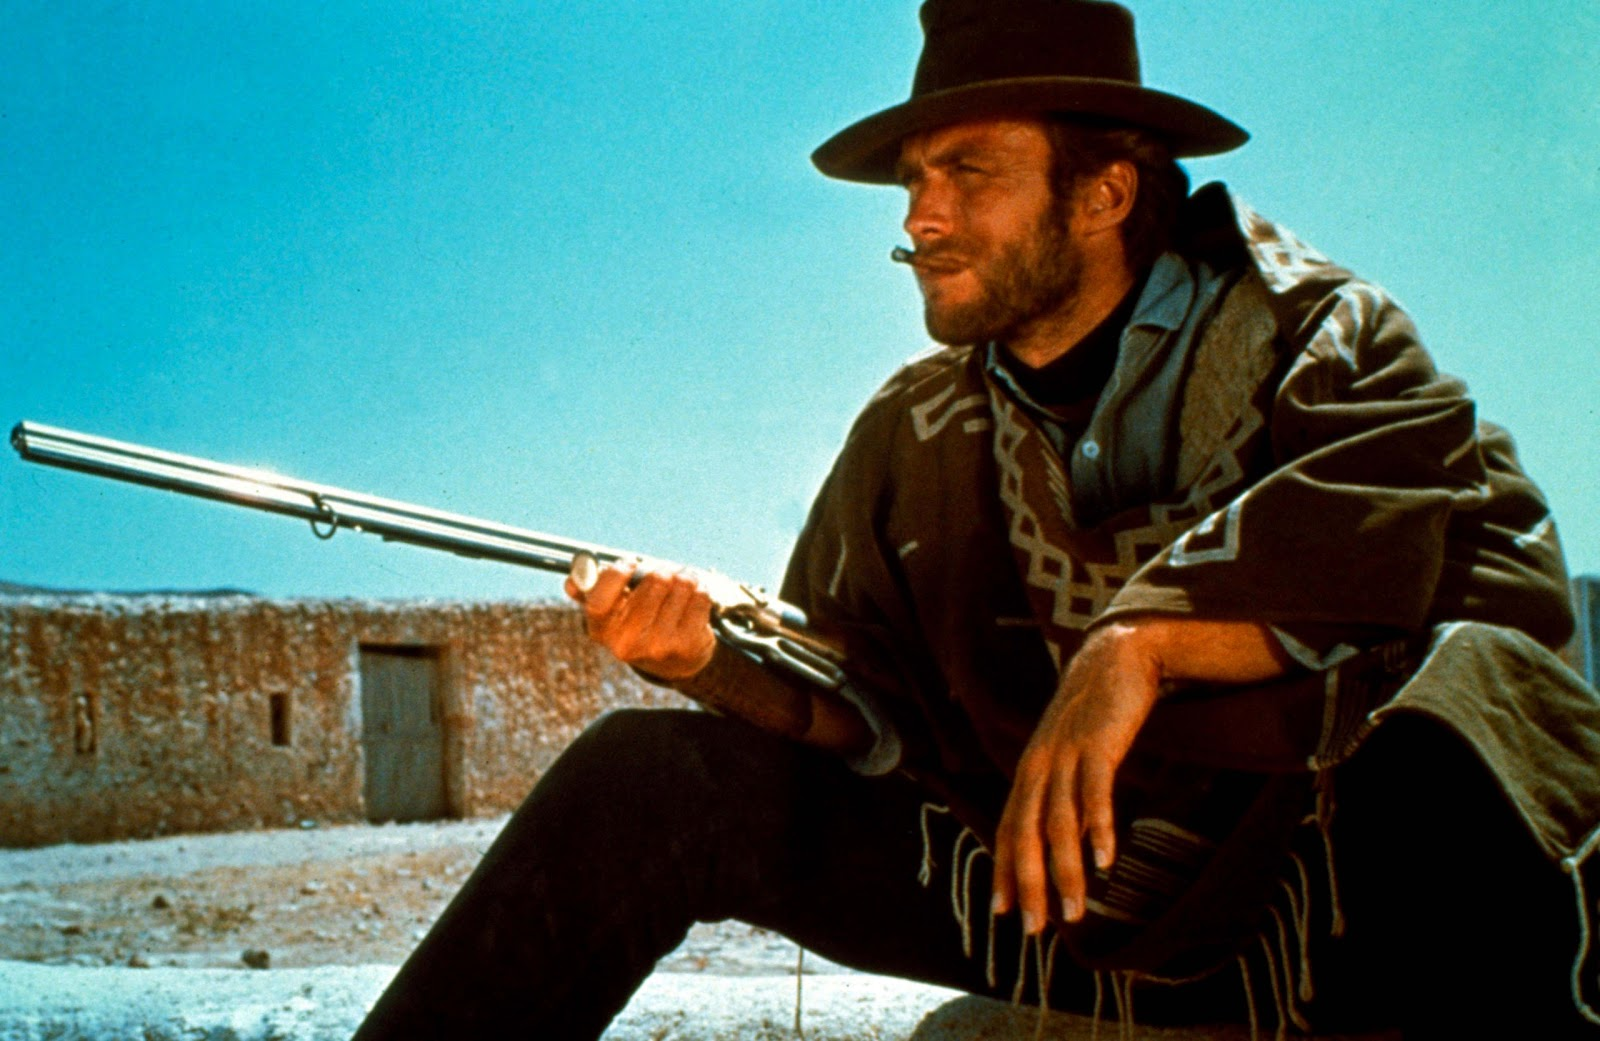 http://1.bp.blogspot.com/-bhozQxyaNAY/TnZnsAq58XI/AAAAAAAADH0/jEkBv3PIkiA/s1600/Clint_Eastwood_Holding_Rifle_Cowboy_HD_Wallpaper_Vvallpaper.NET.jpg